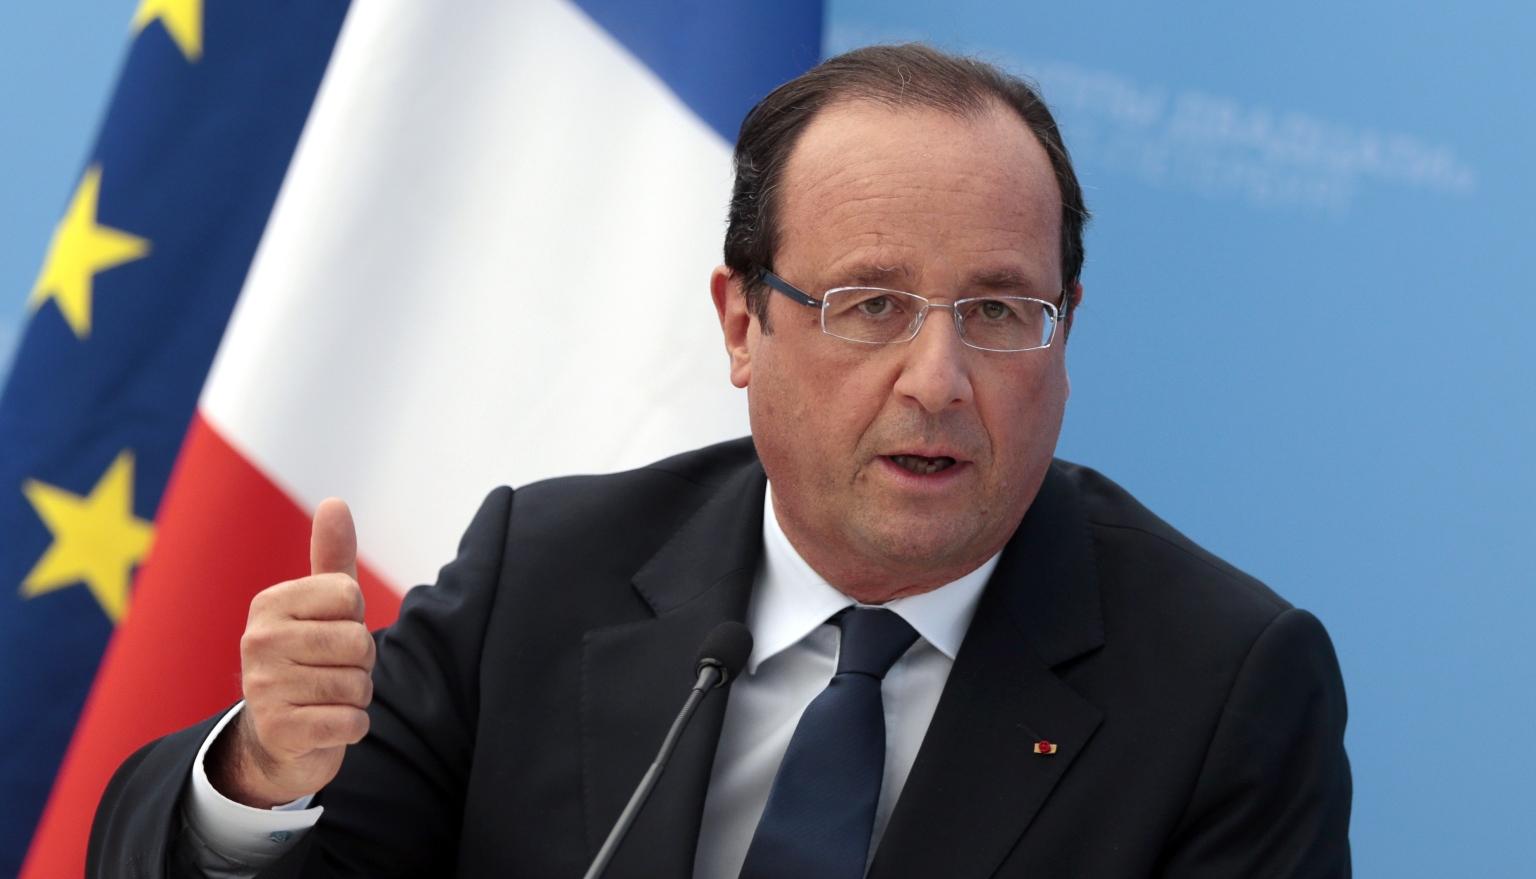 Hollande: Now we must examine Greek debt relief